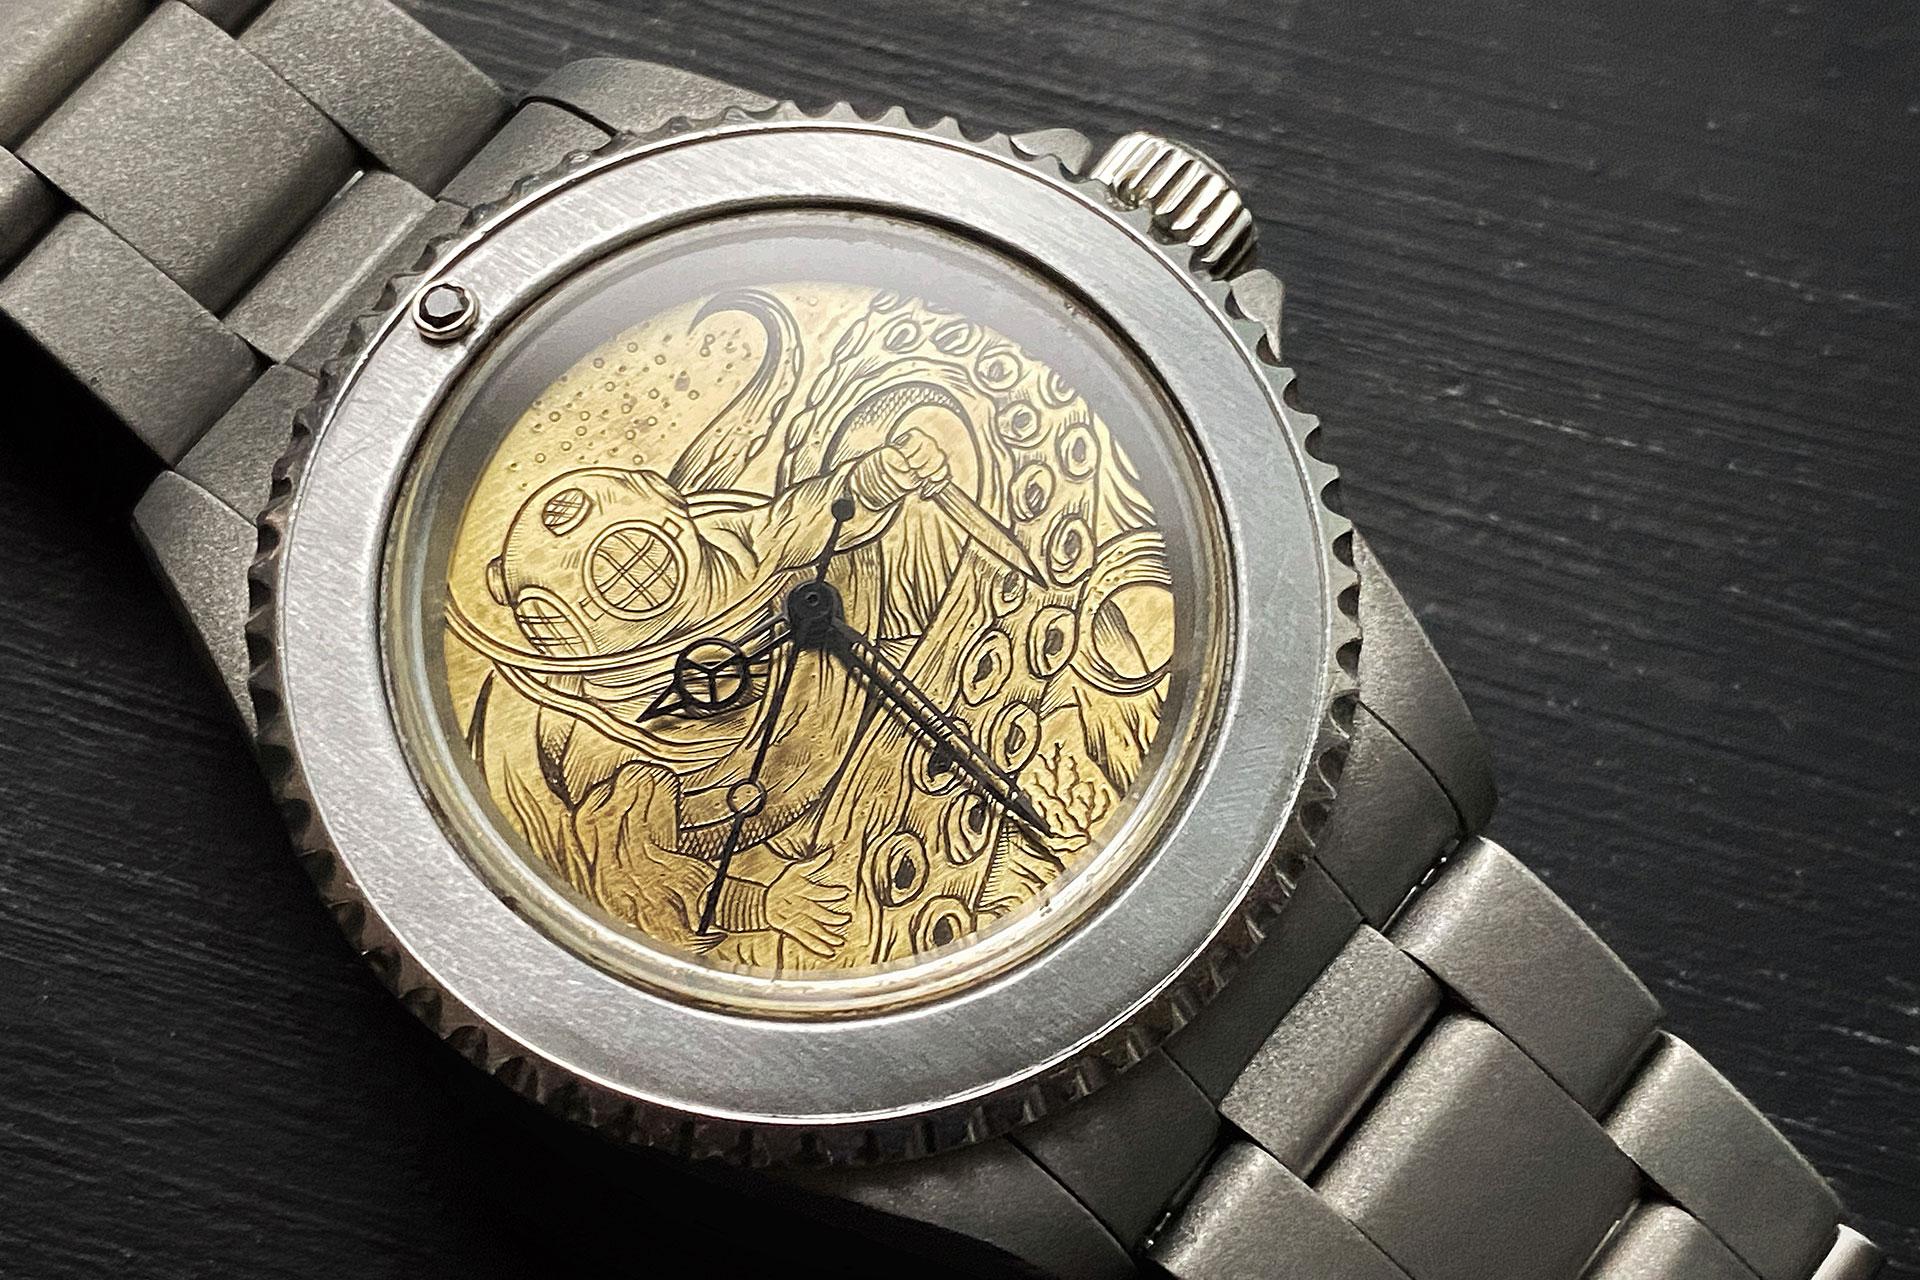 Mister Enthusiast x King Nerd Engraved Rolex Submariner Watch